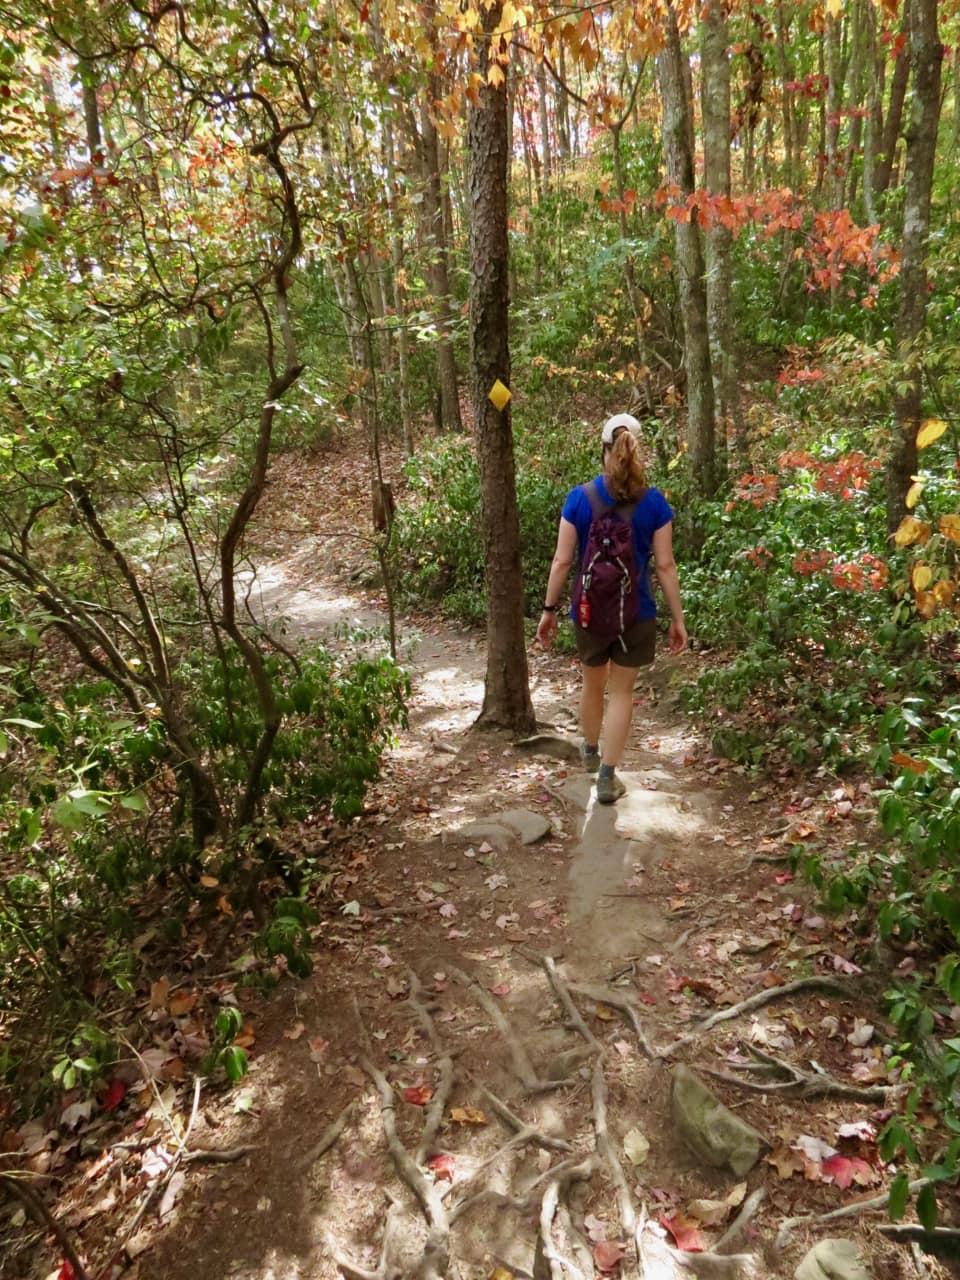 Bonnie on the Trail